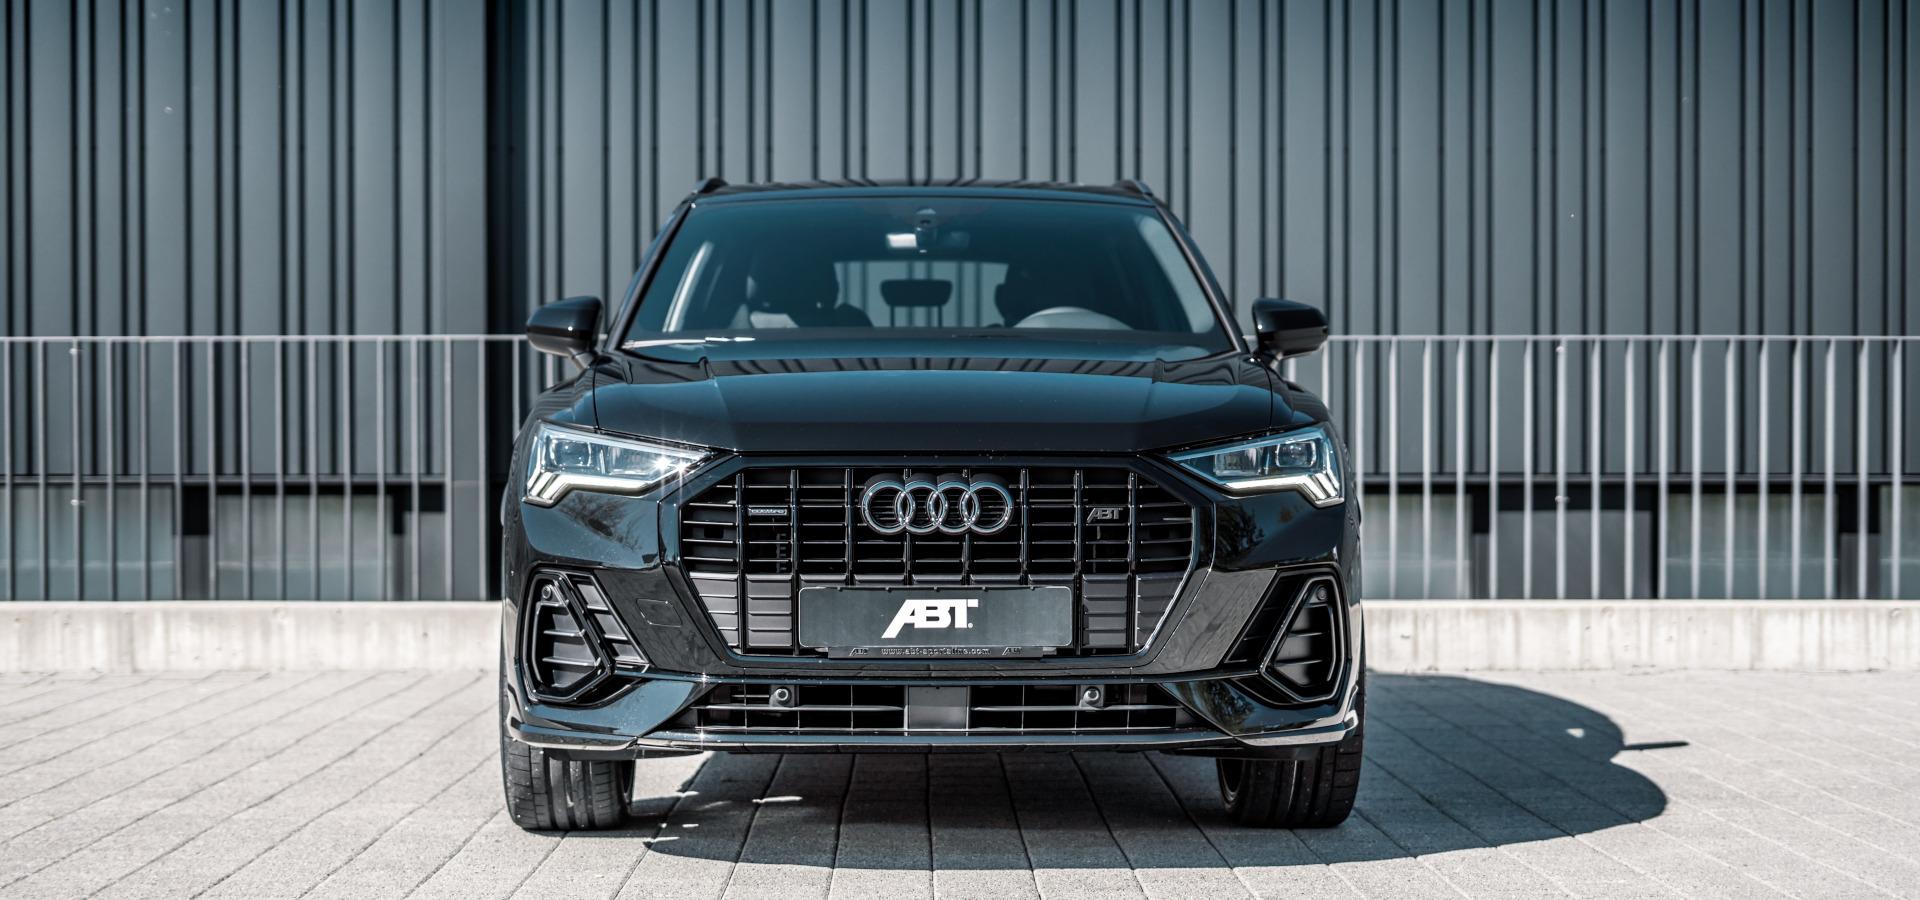 Audi Q3 - ABT Sportsline